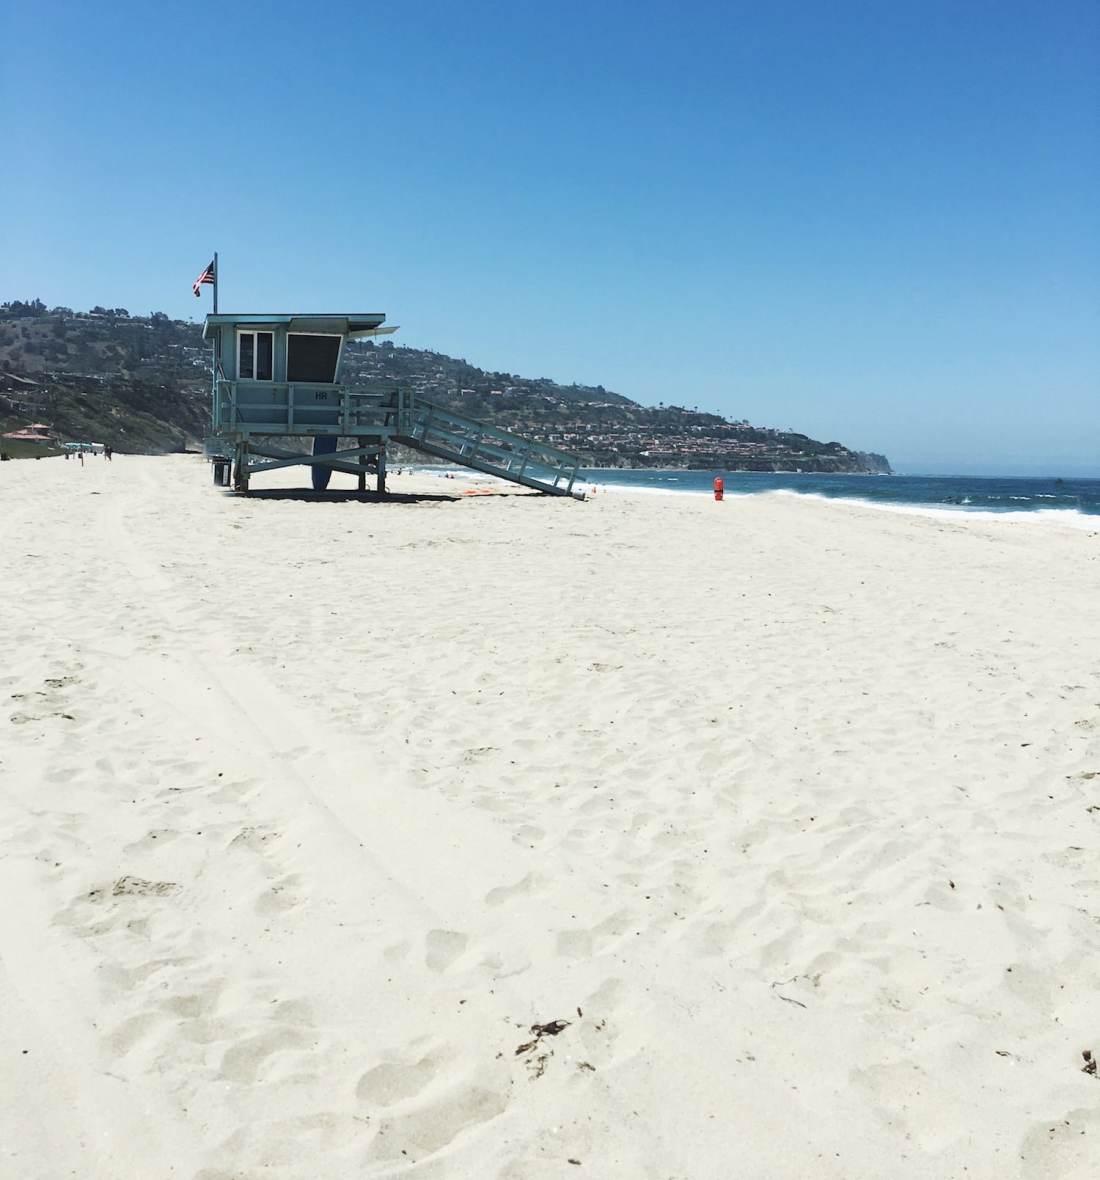 Torrance Beach